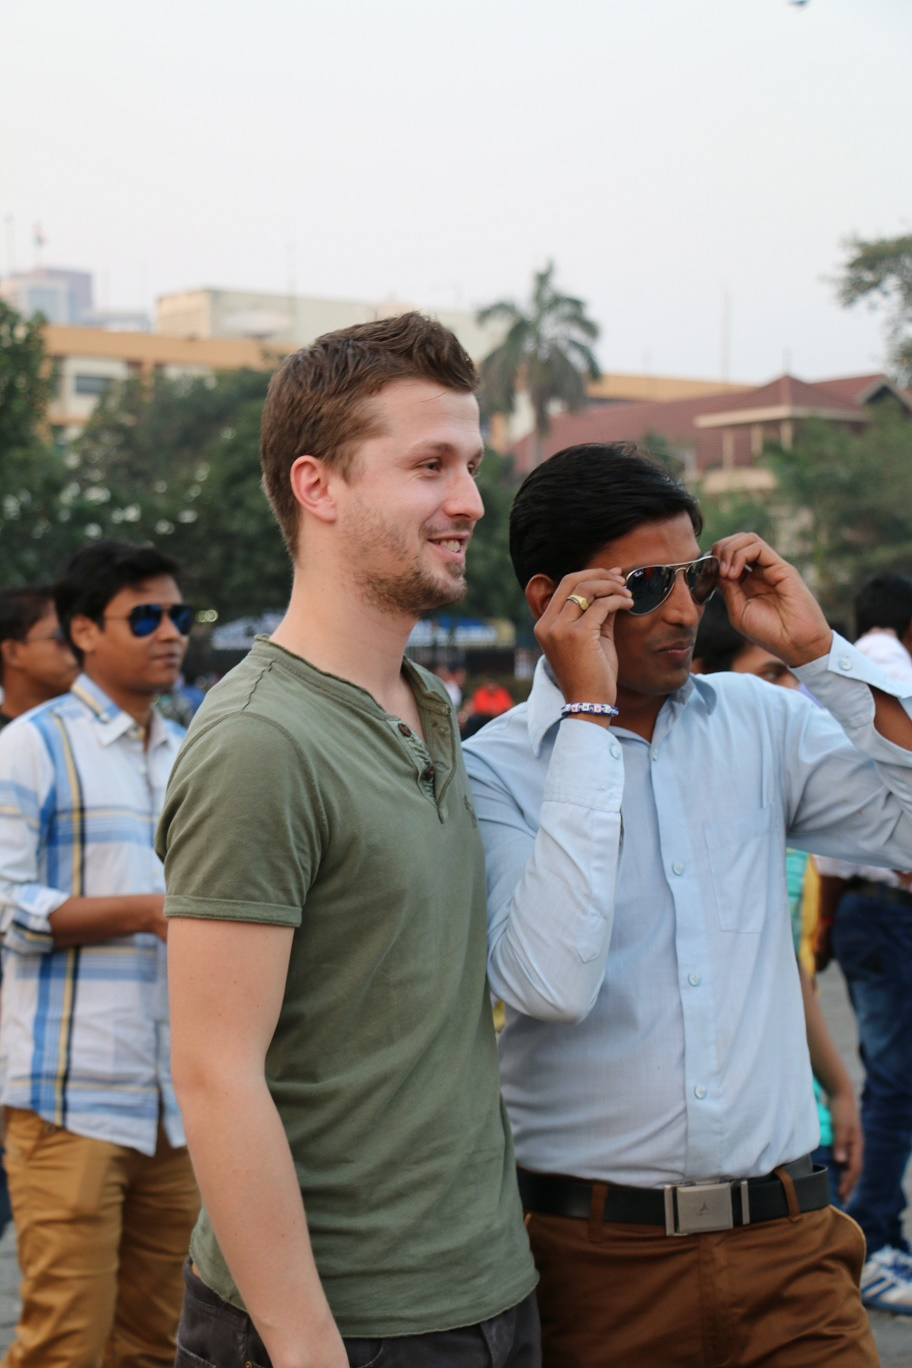 Mumbai_GatewayOfIndia_24